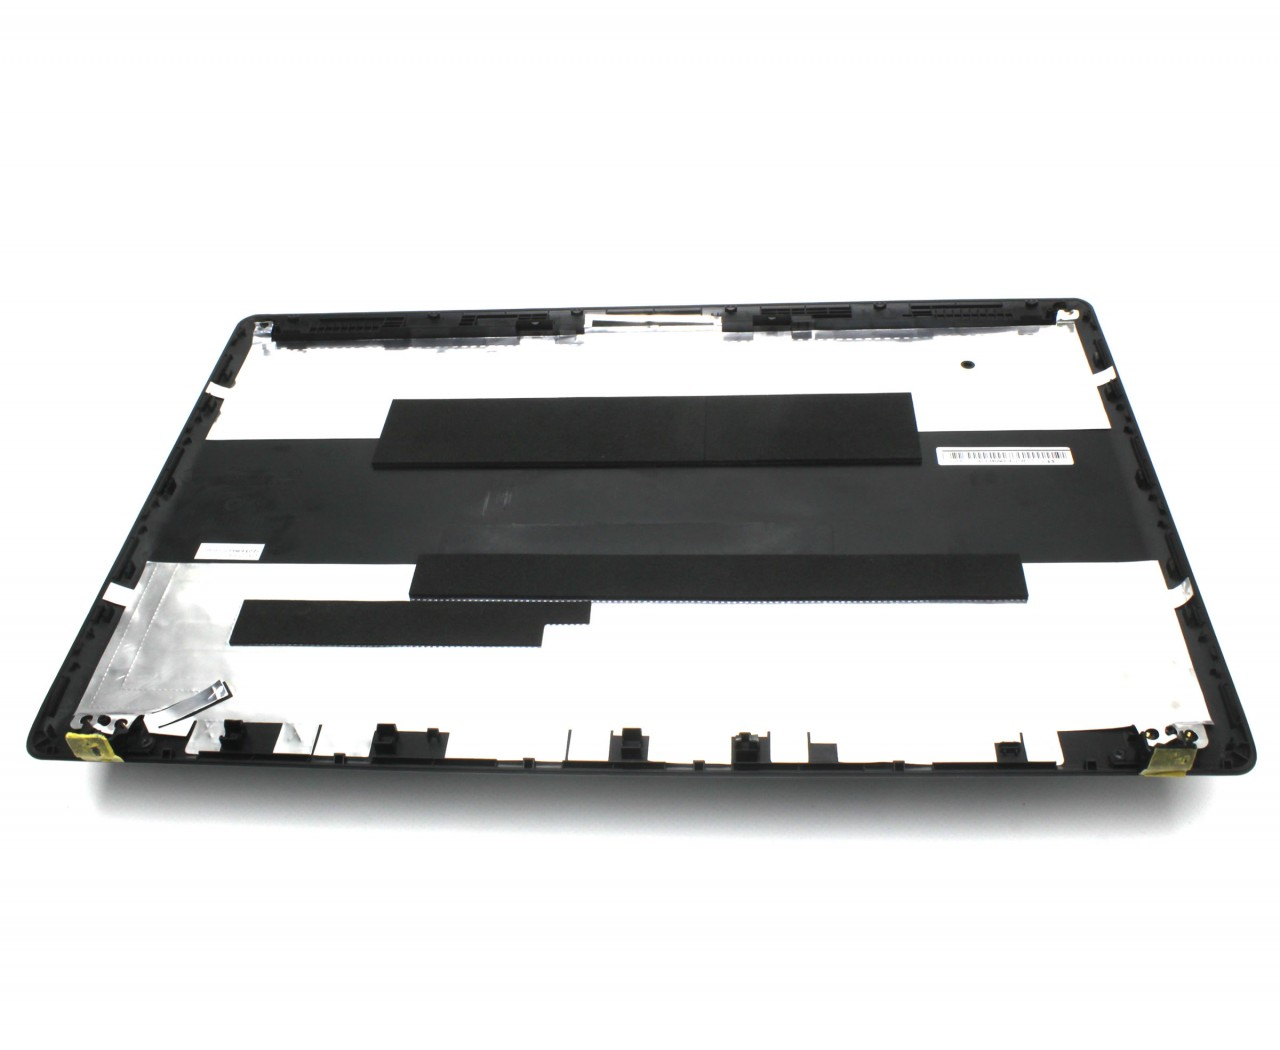 Capac Display BackCover IBM Lenovo G570G Carcasa Display Neagra imagine powerlaptop.ro 2021